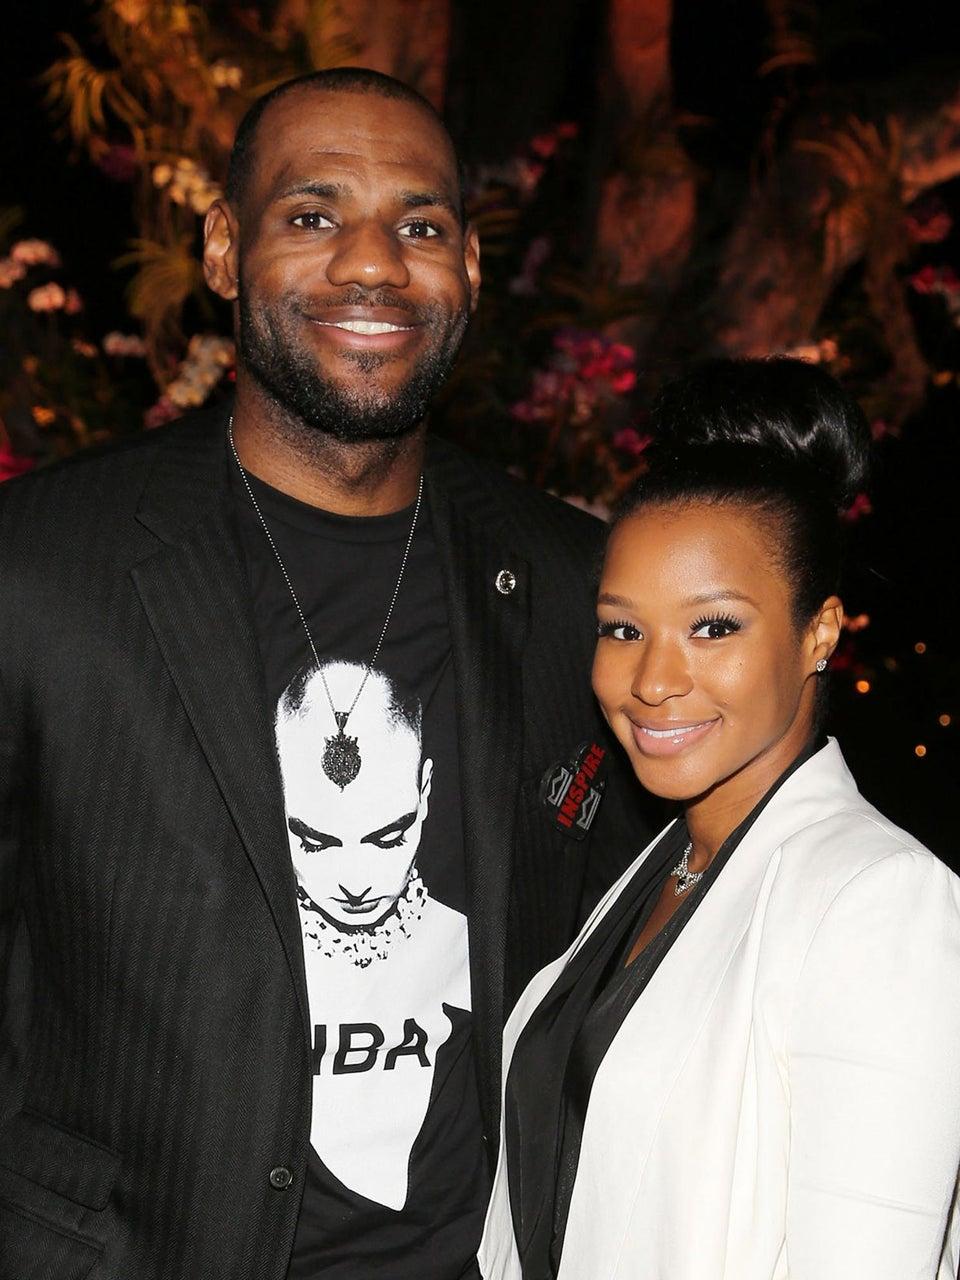 LeBron James and Savannah Brinson Set Wedding Date